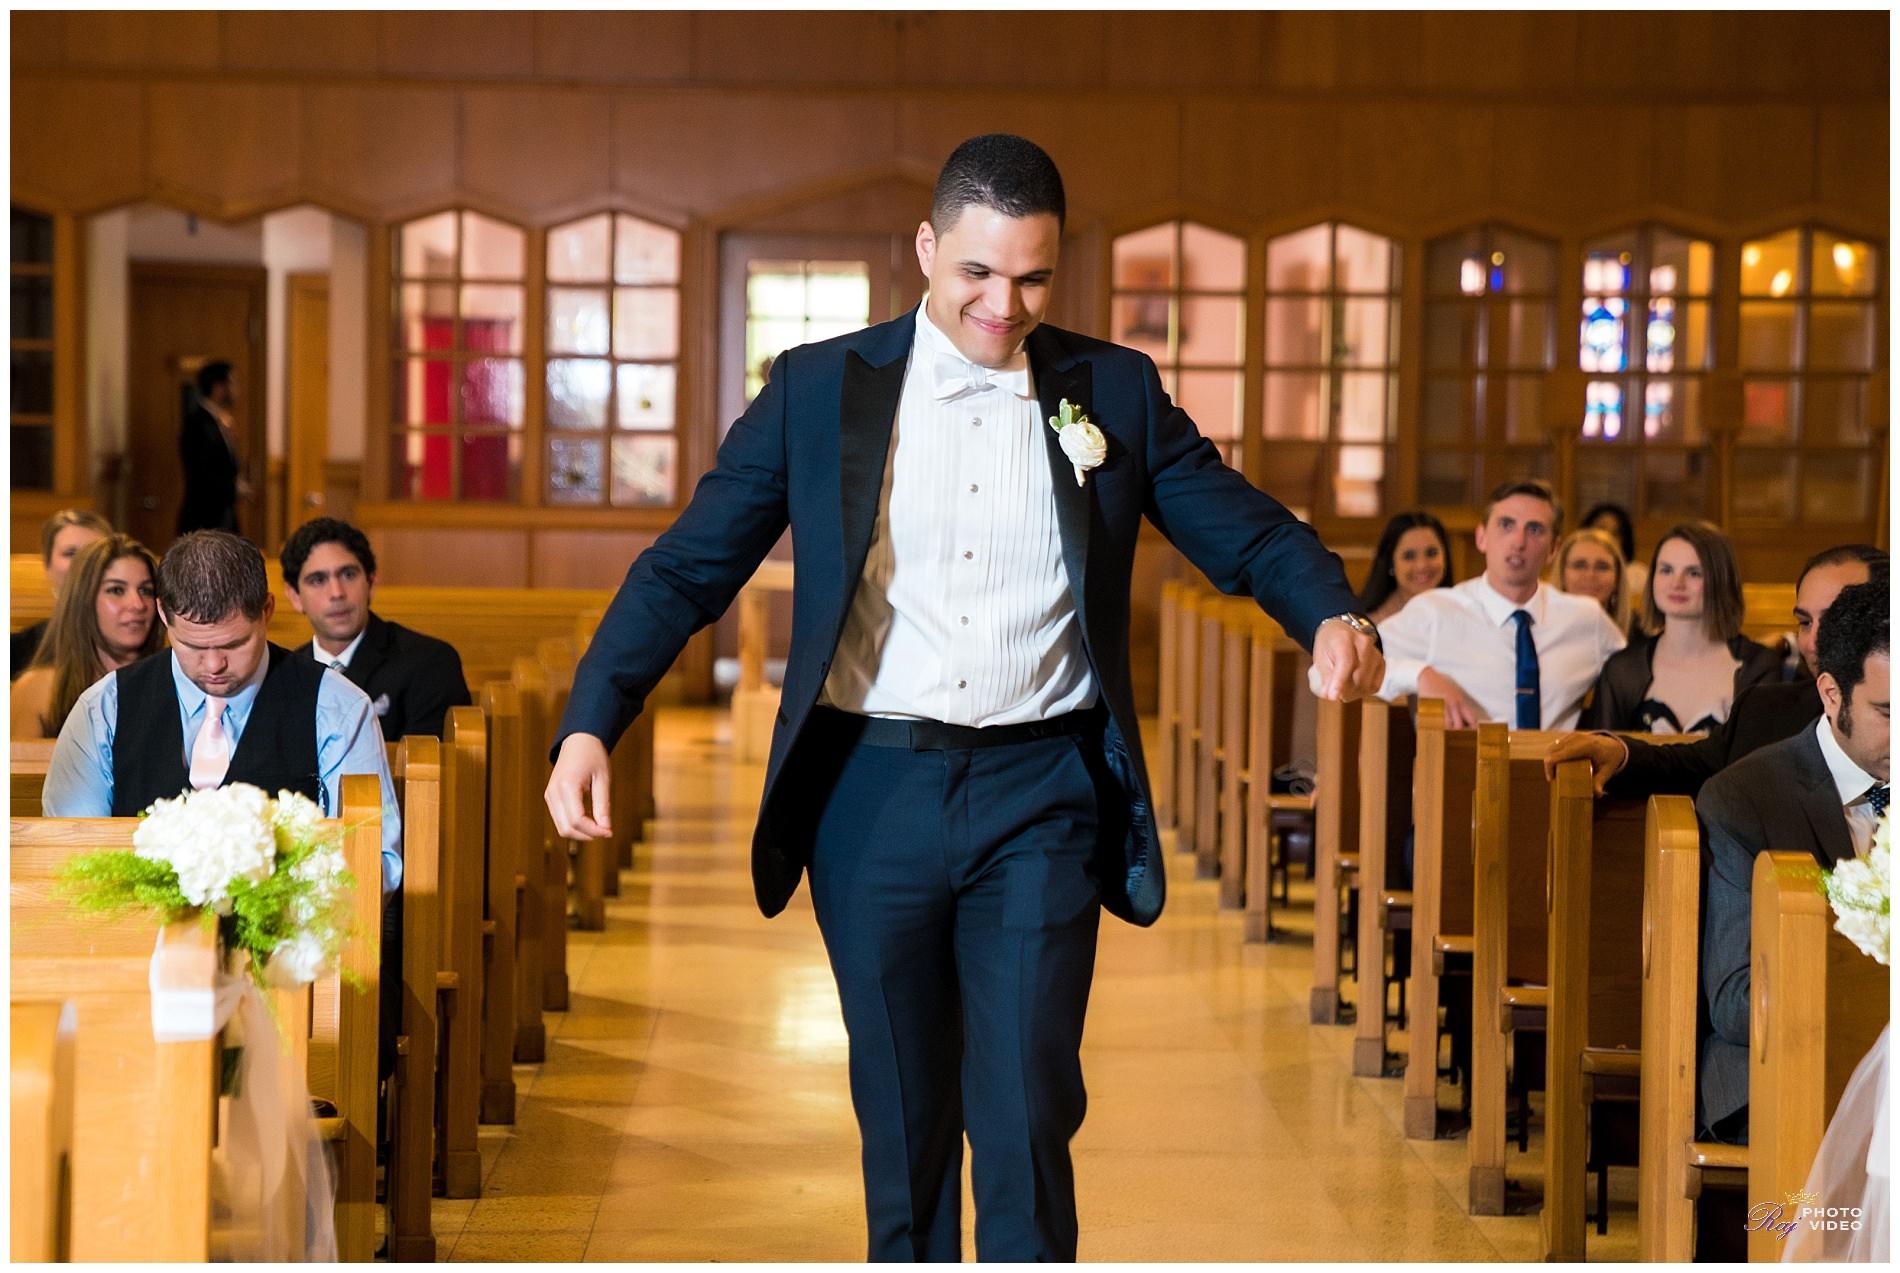 St-Valentines-Catholic-Church-Bloomfield-NJ-Wedding-Yanet-Jose-2.jpg